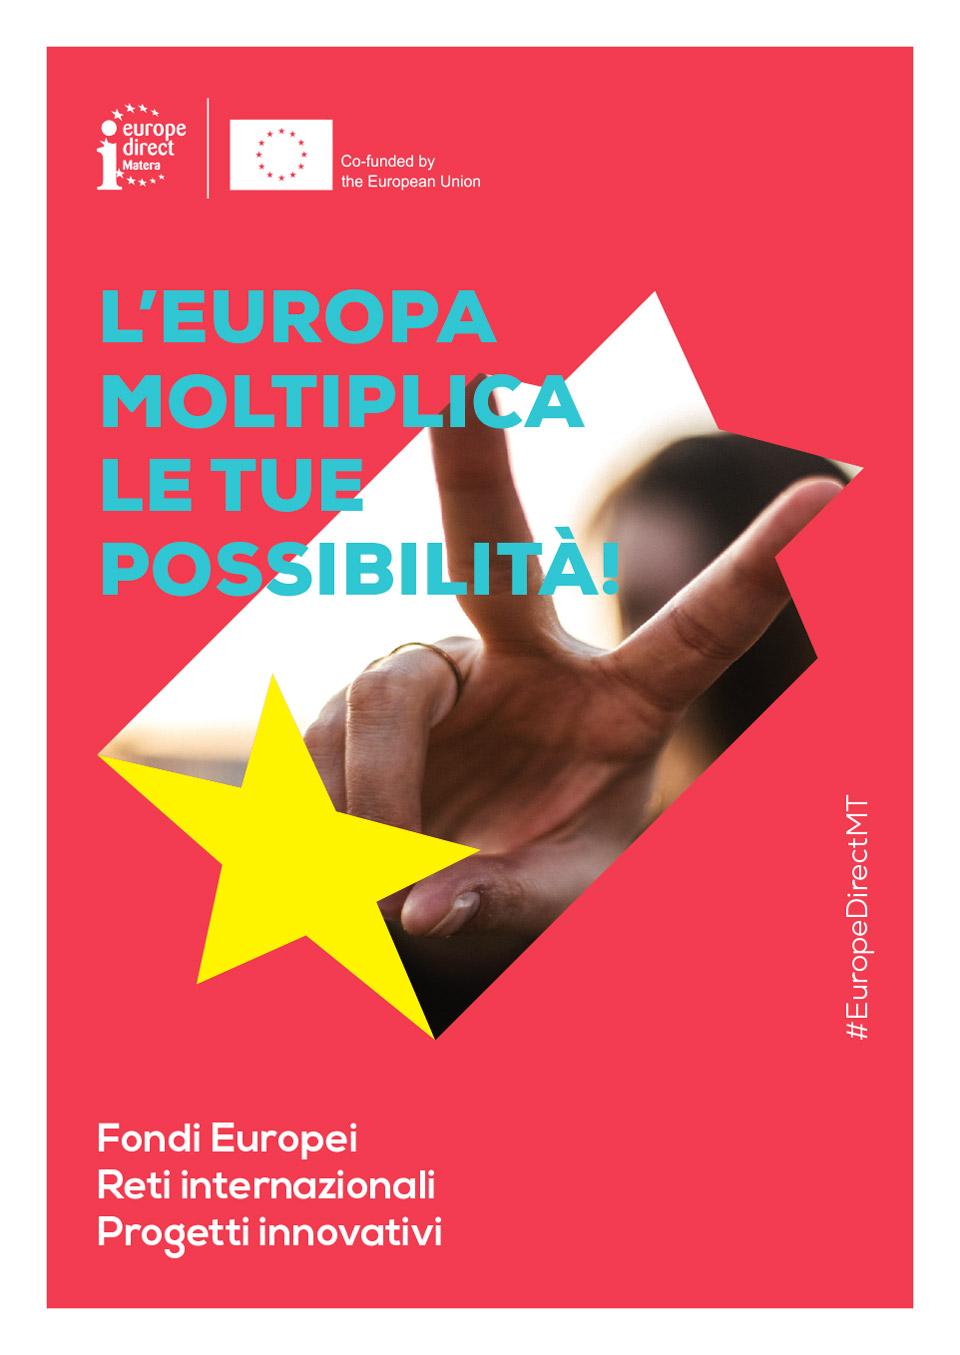 europe direct matera ego55 brand